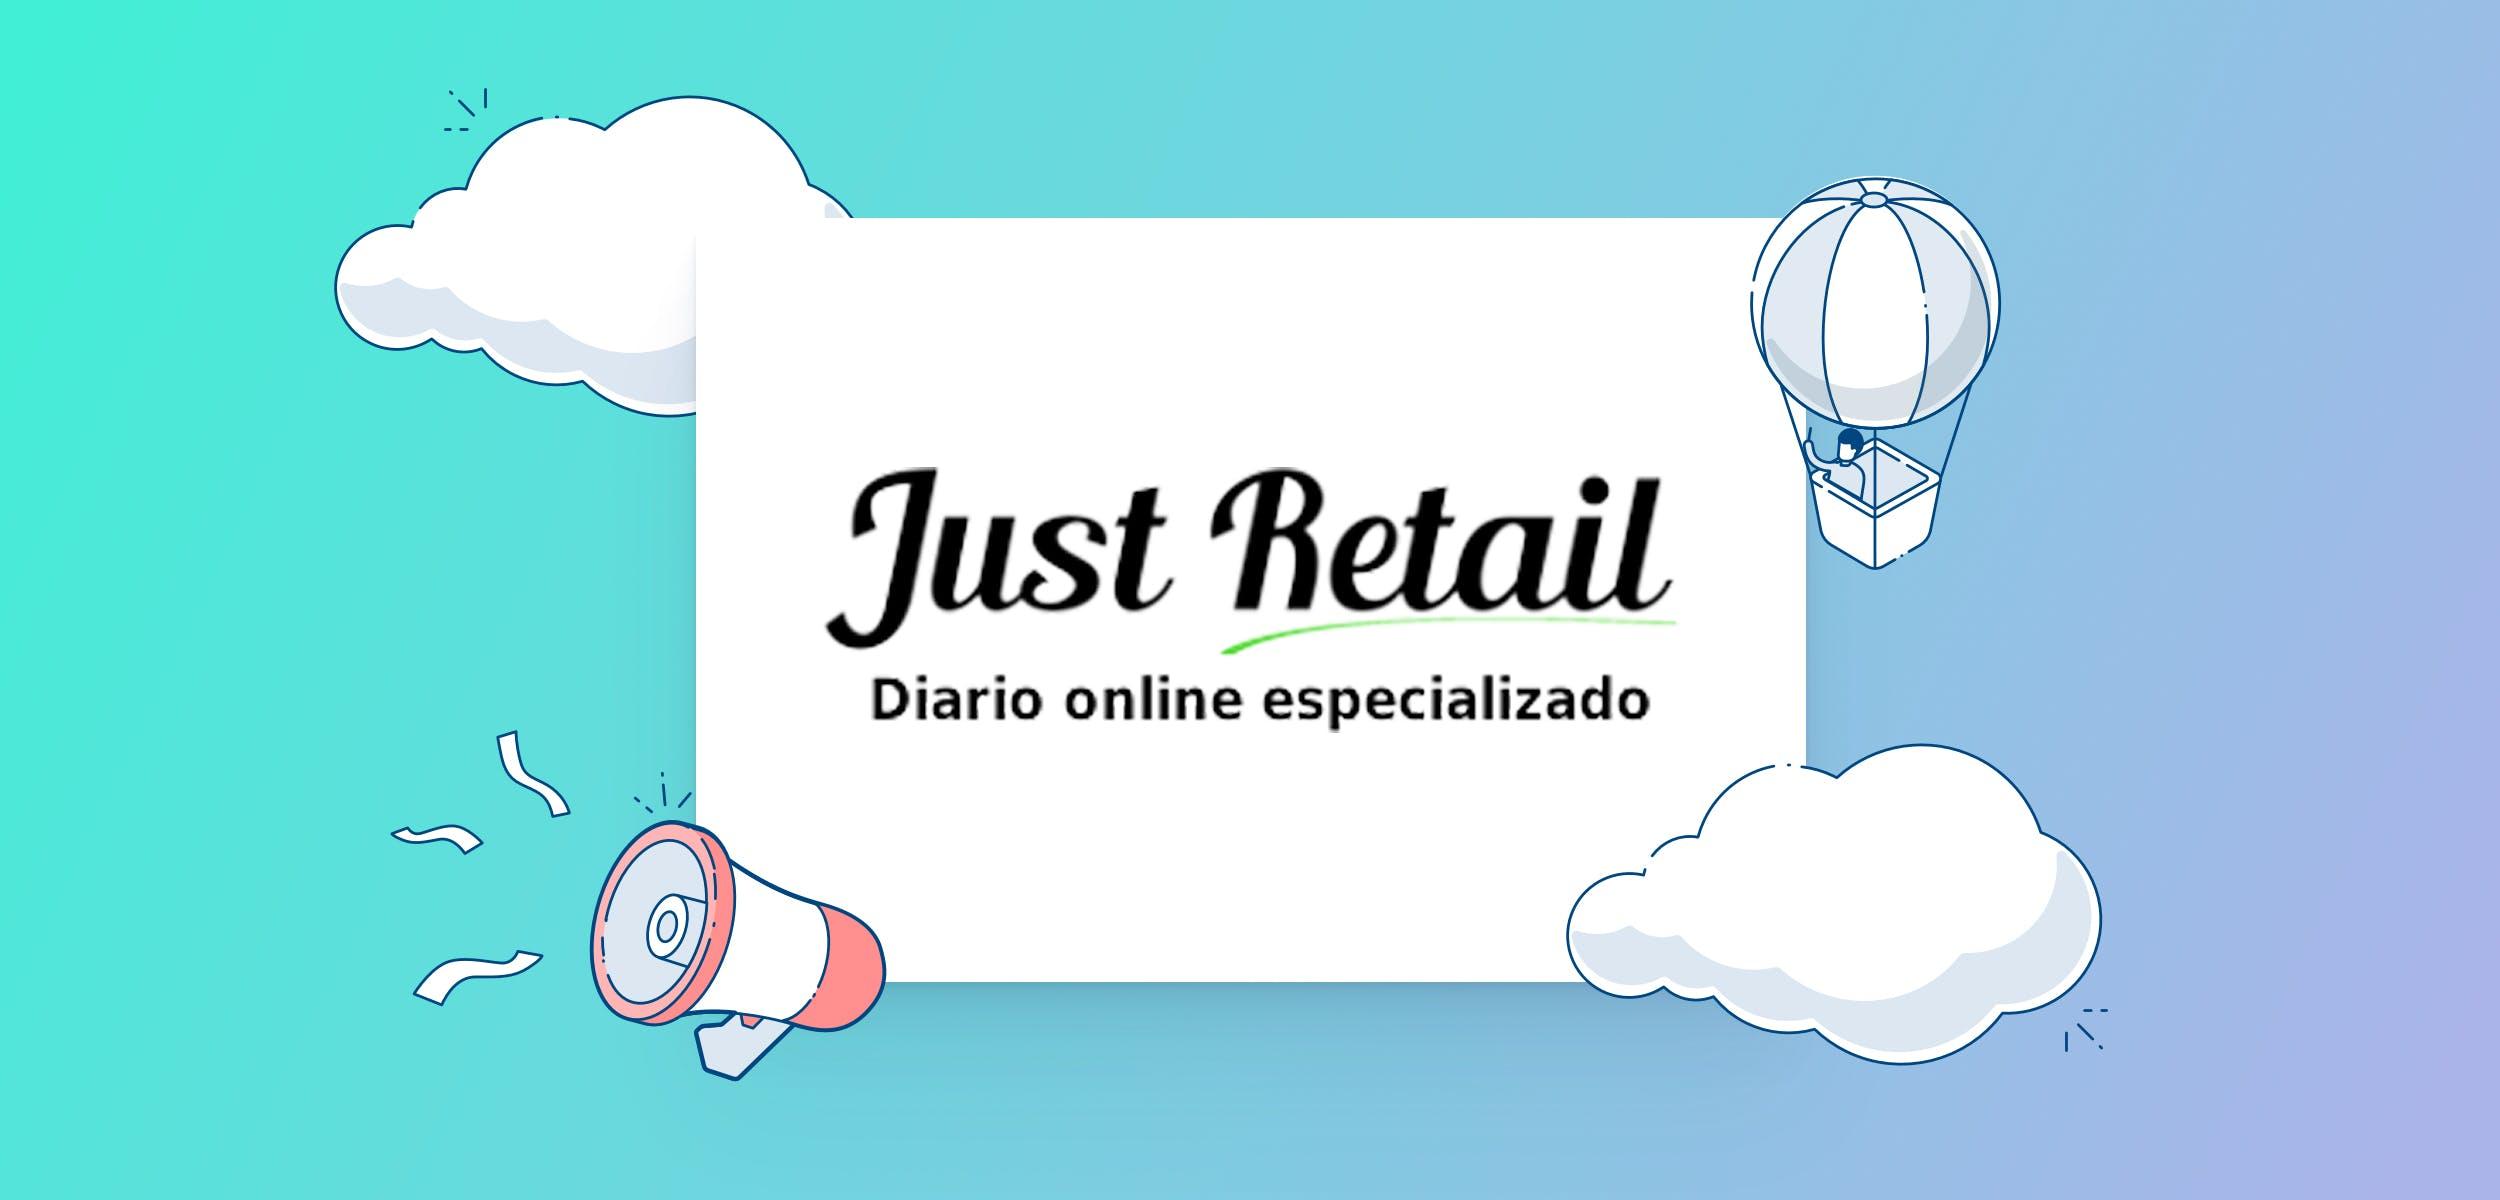 Just Retal logo